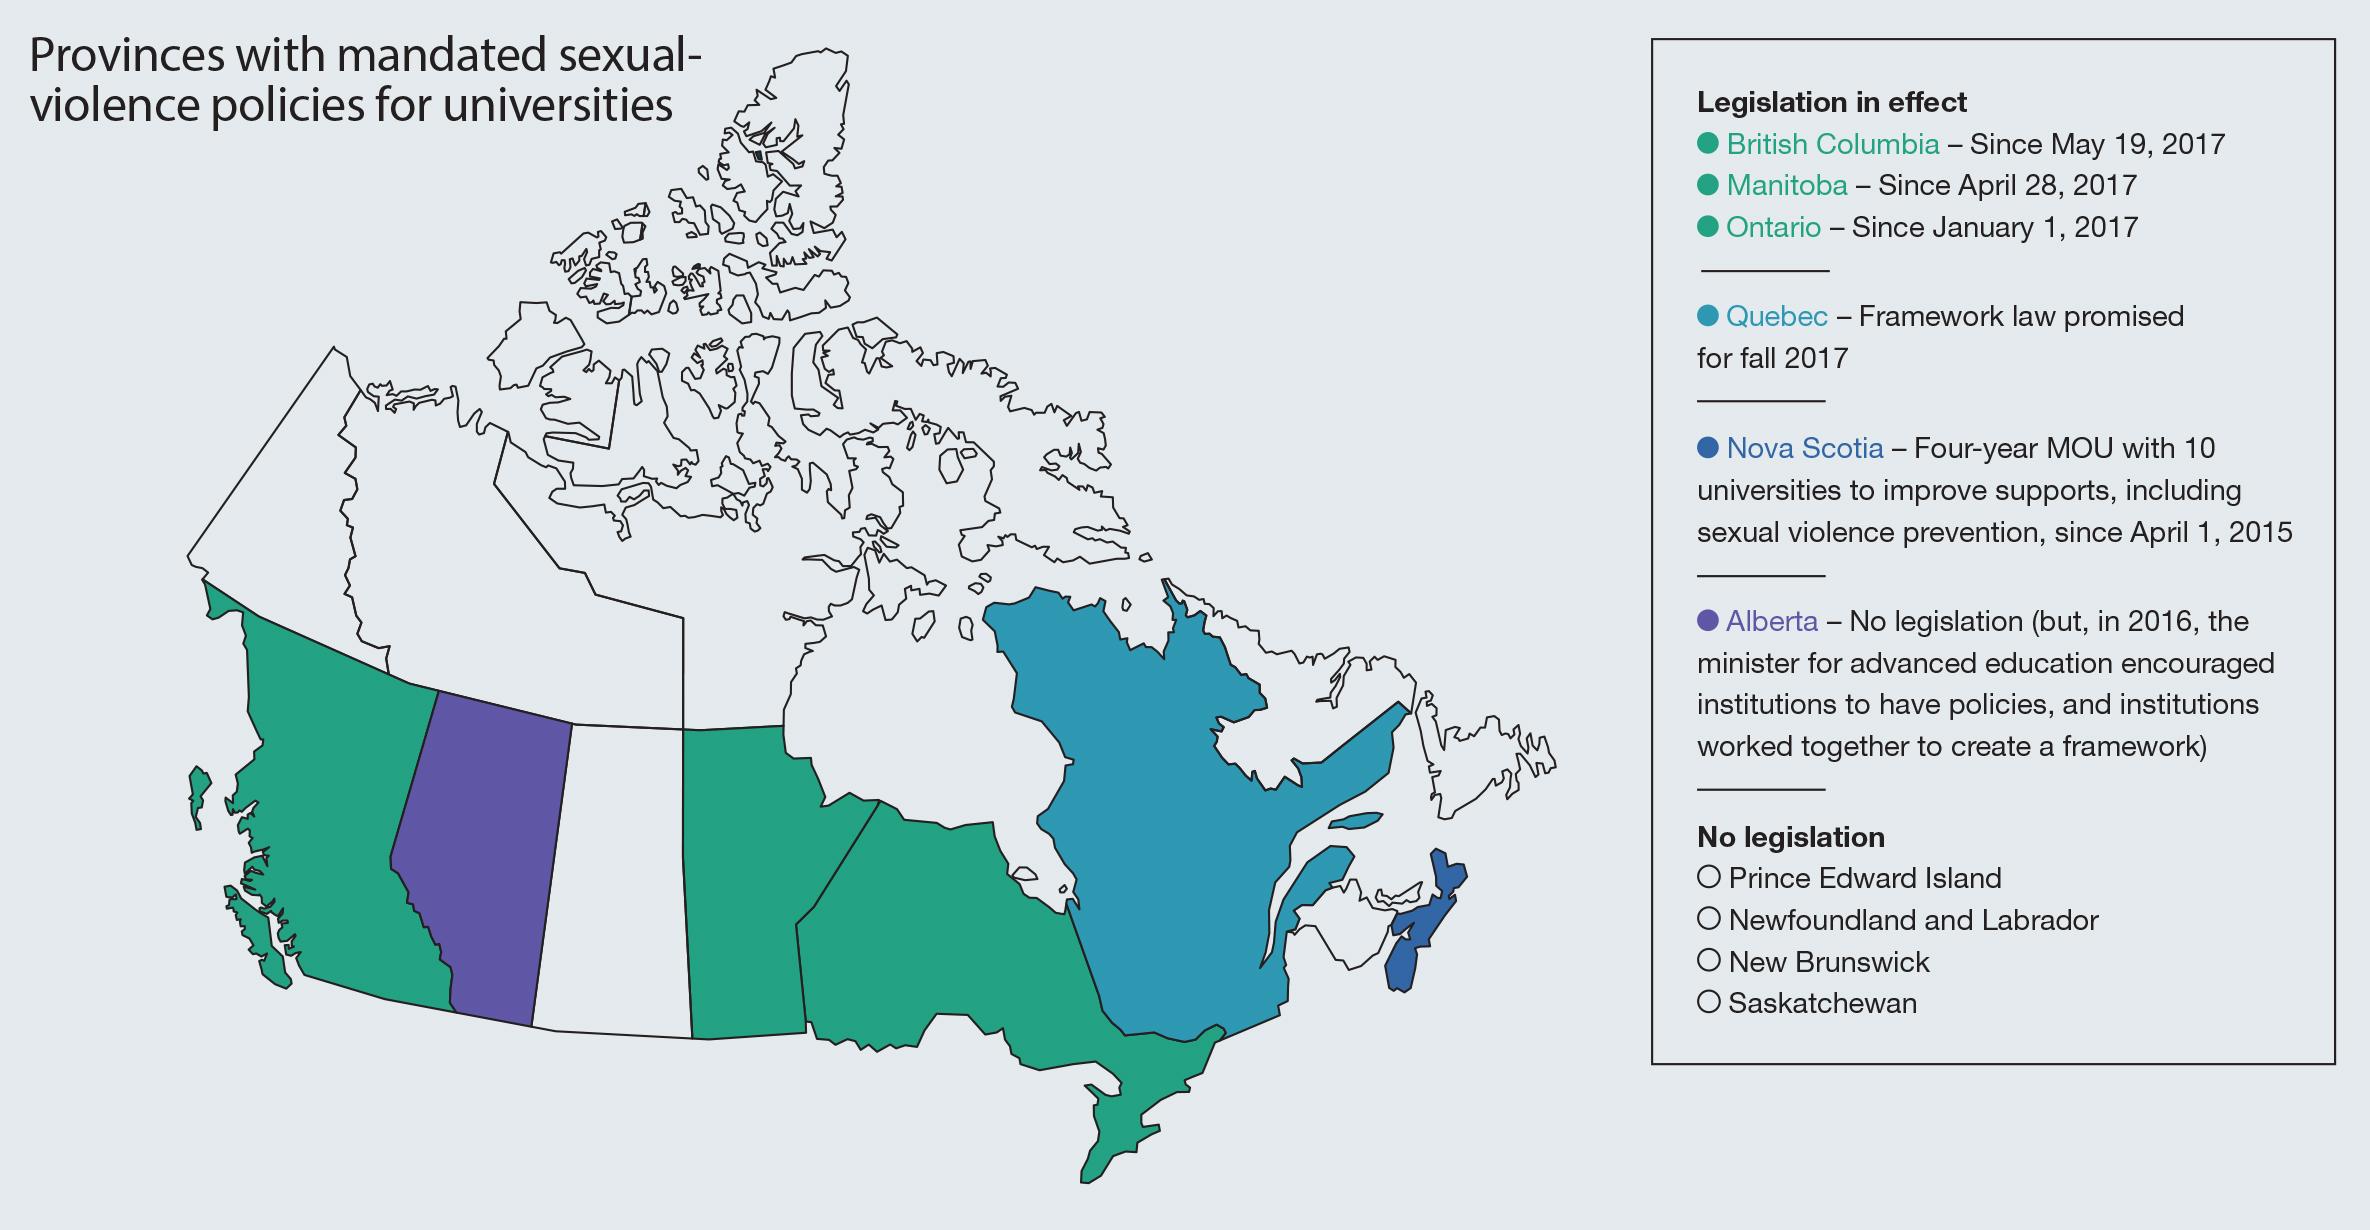 should quebec or other provinces separate